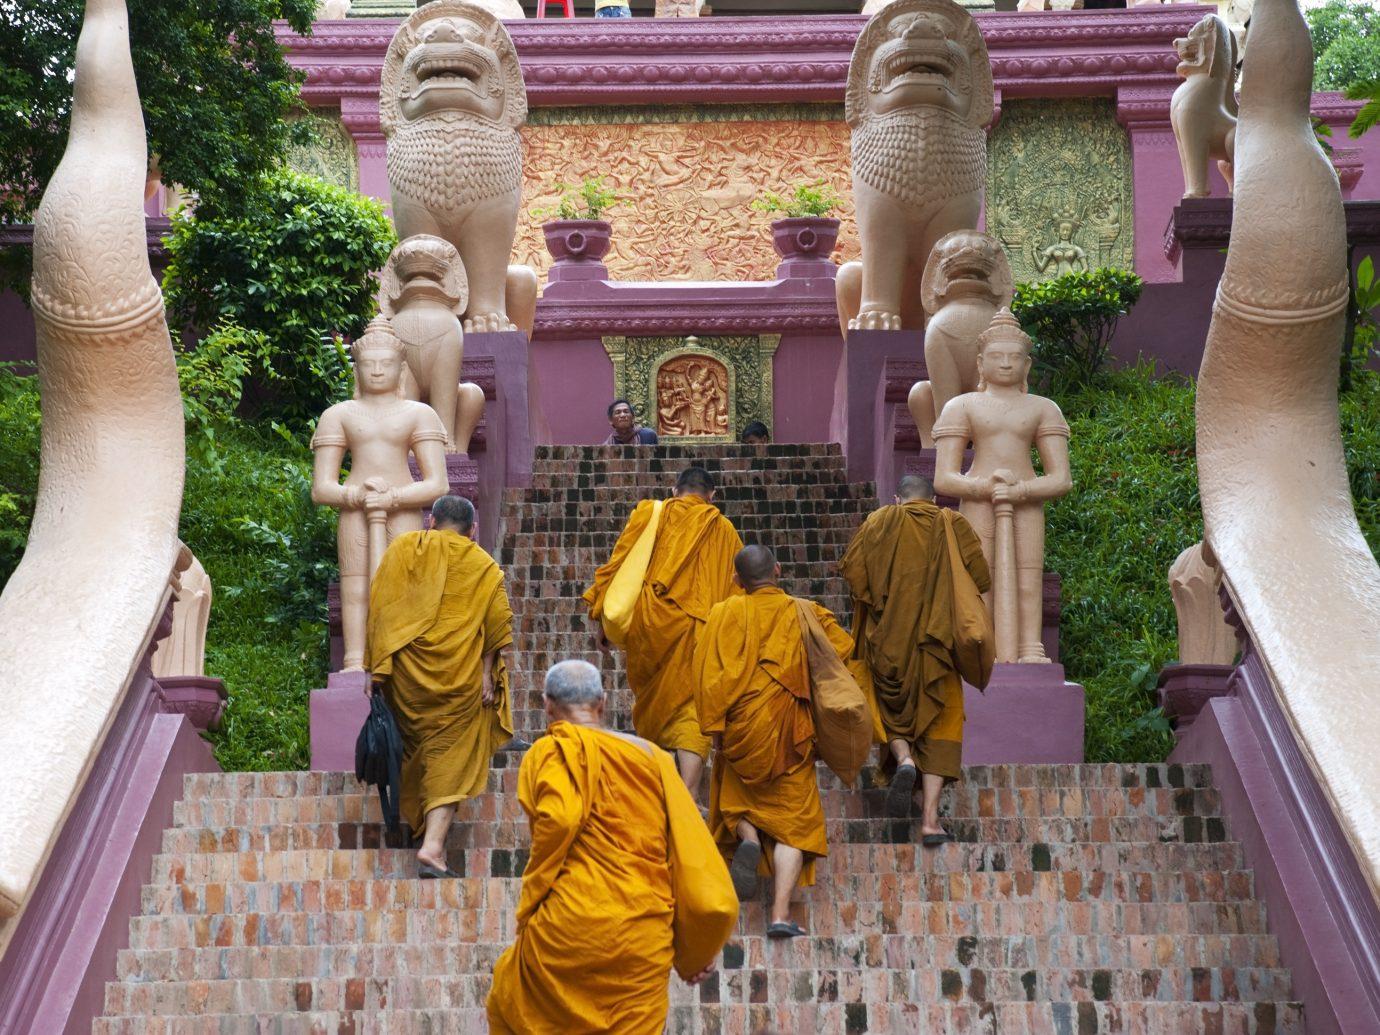 Trip Ideas outdoor statue sculpture place of worship temple hindu temple religion wat tourism shrine monument gautama buddha